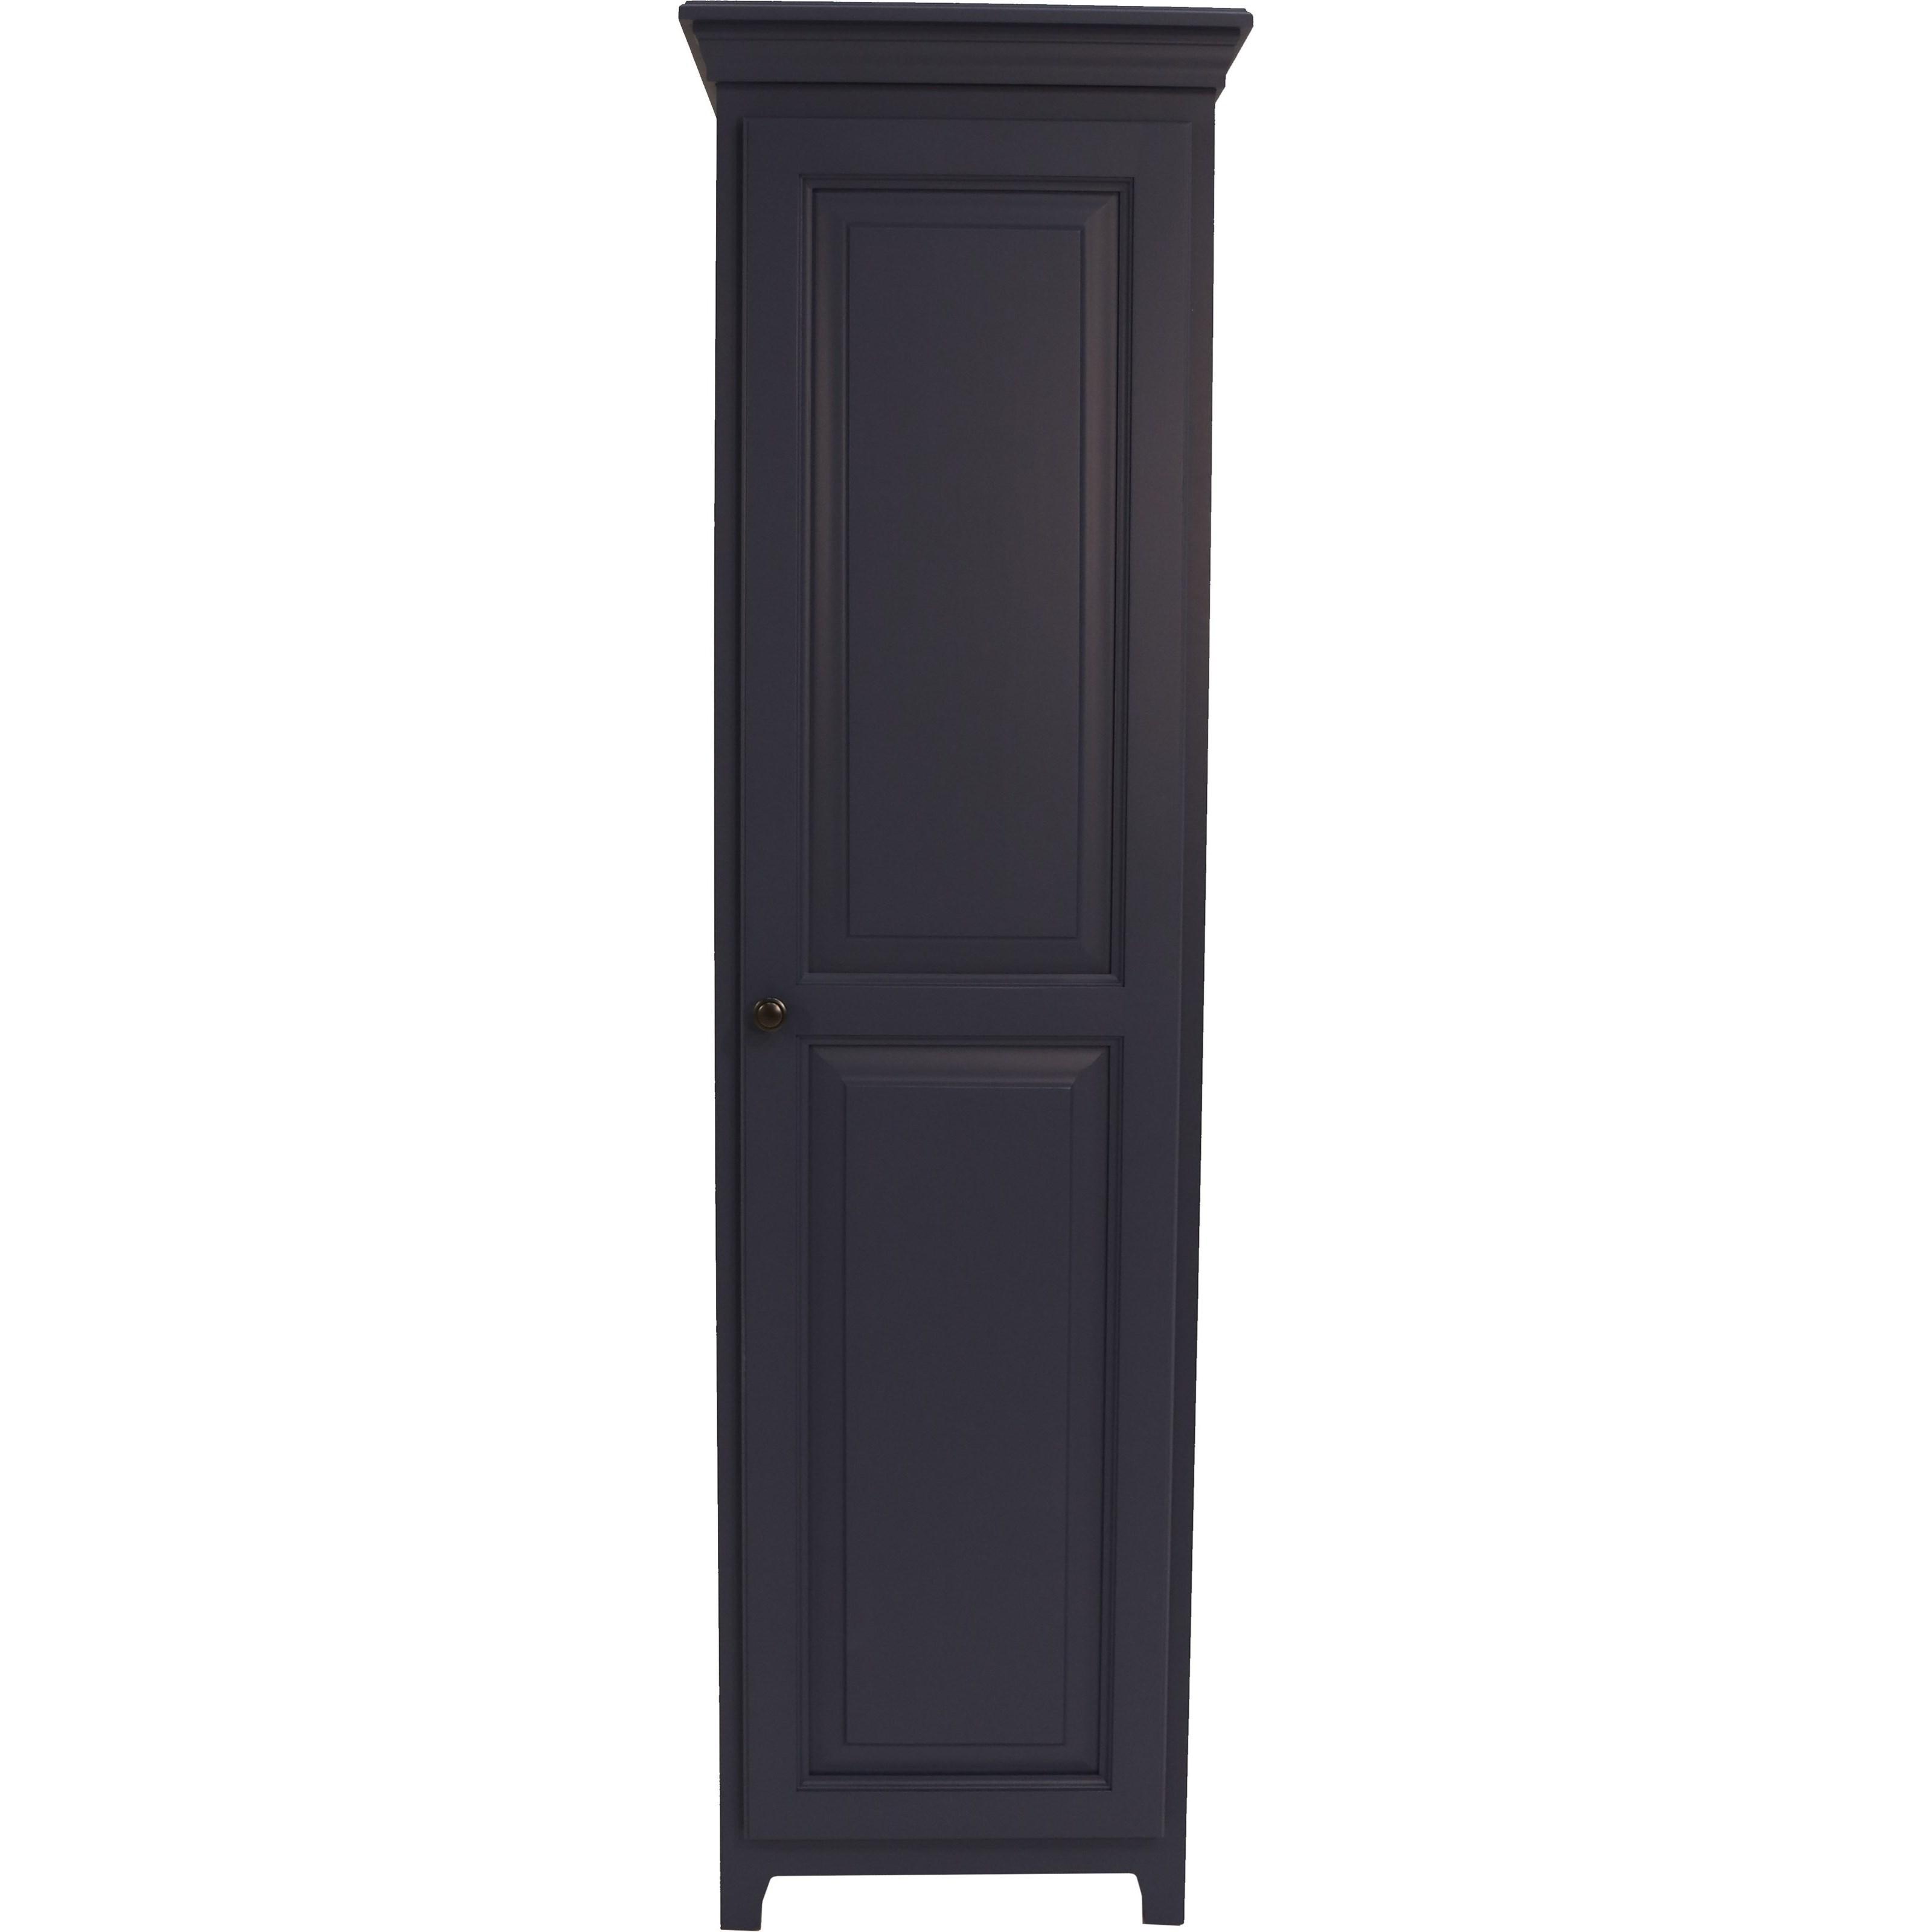 Pantries and Cabinets 1 Door Pantry at Williams & Kay